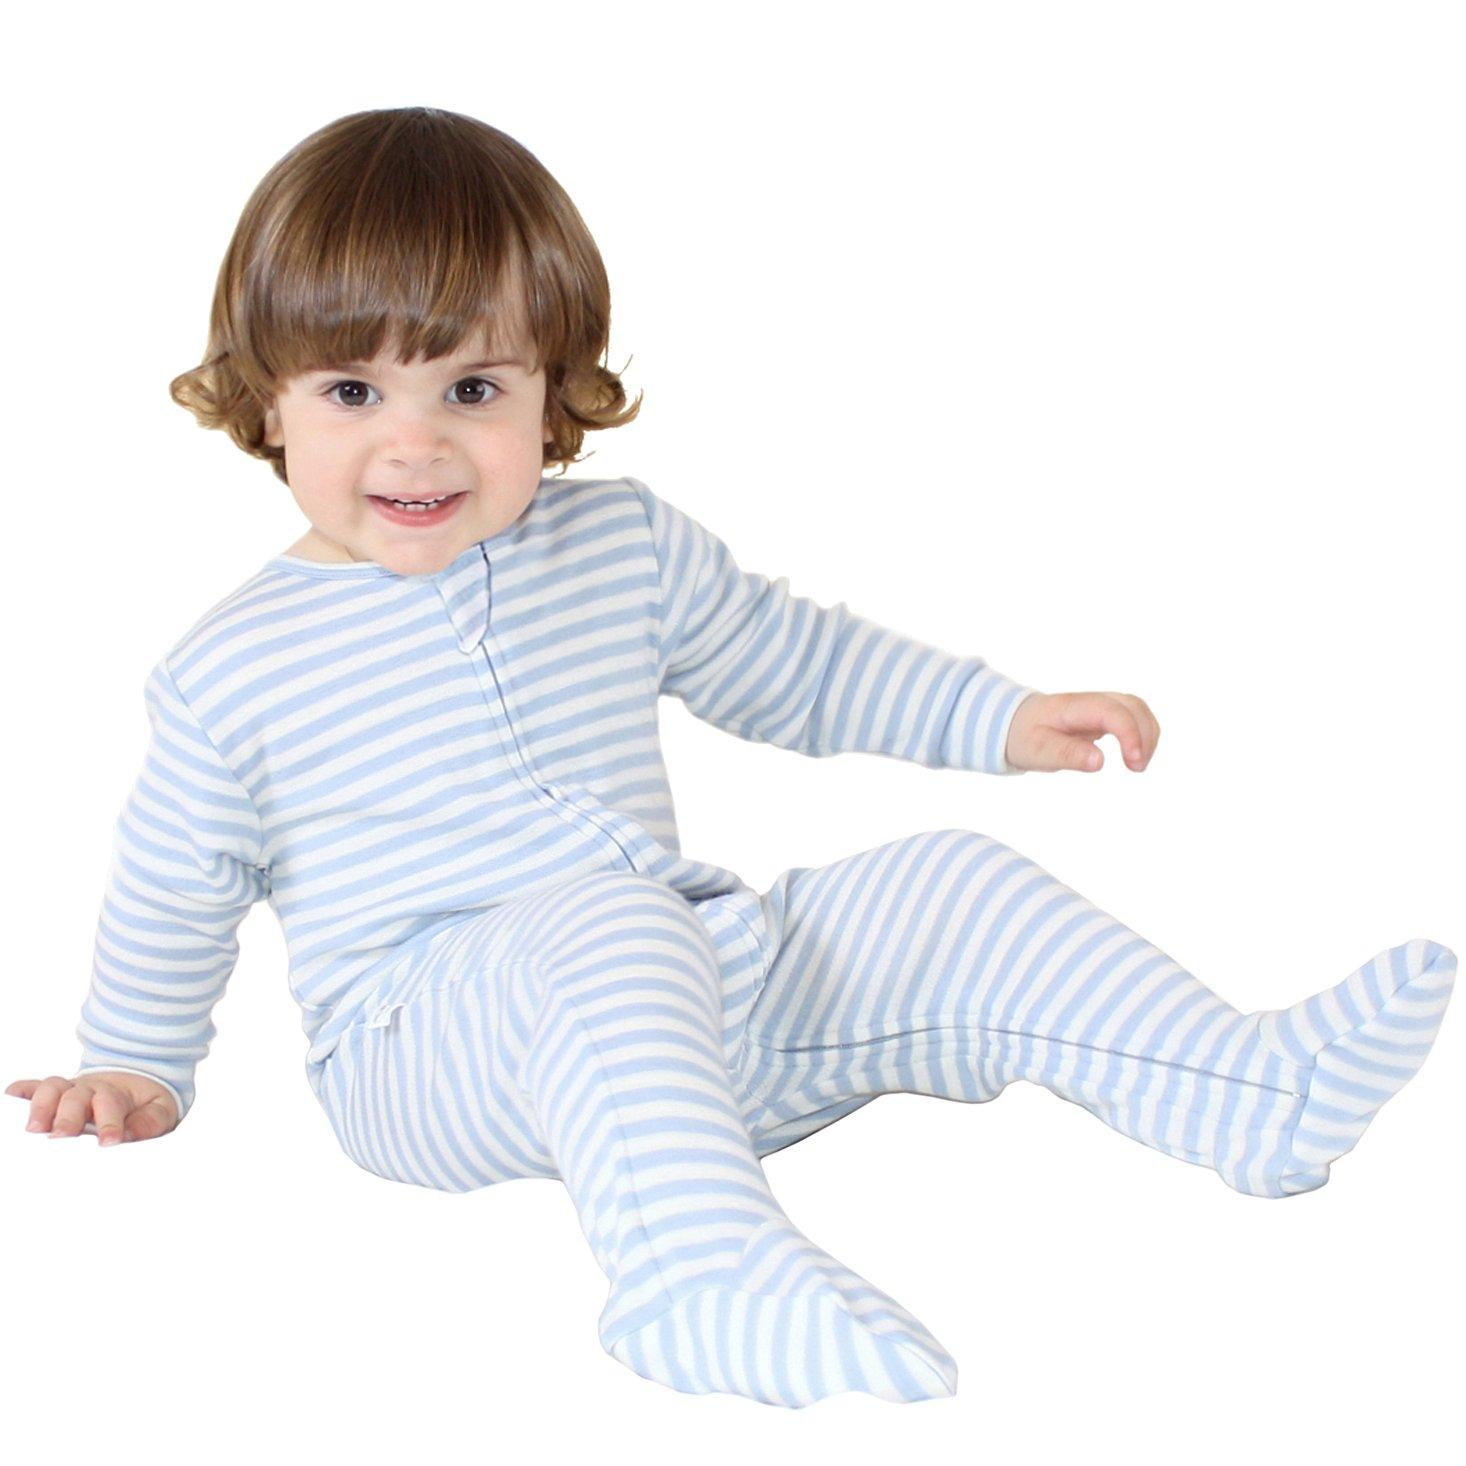 Woolino Footie Sleeper, 100% Superfine Merino Wool Sleeper, 0-3 Months, Blue